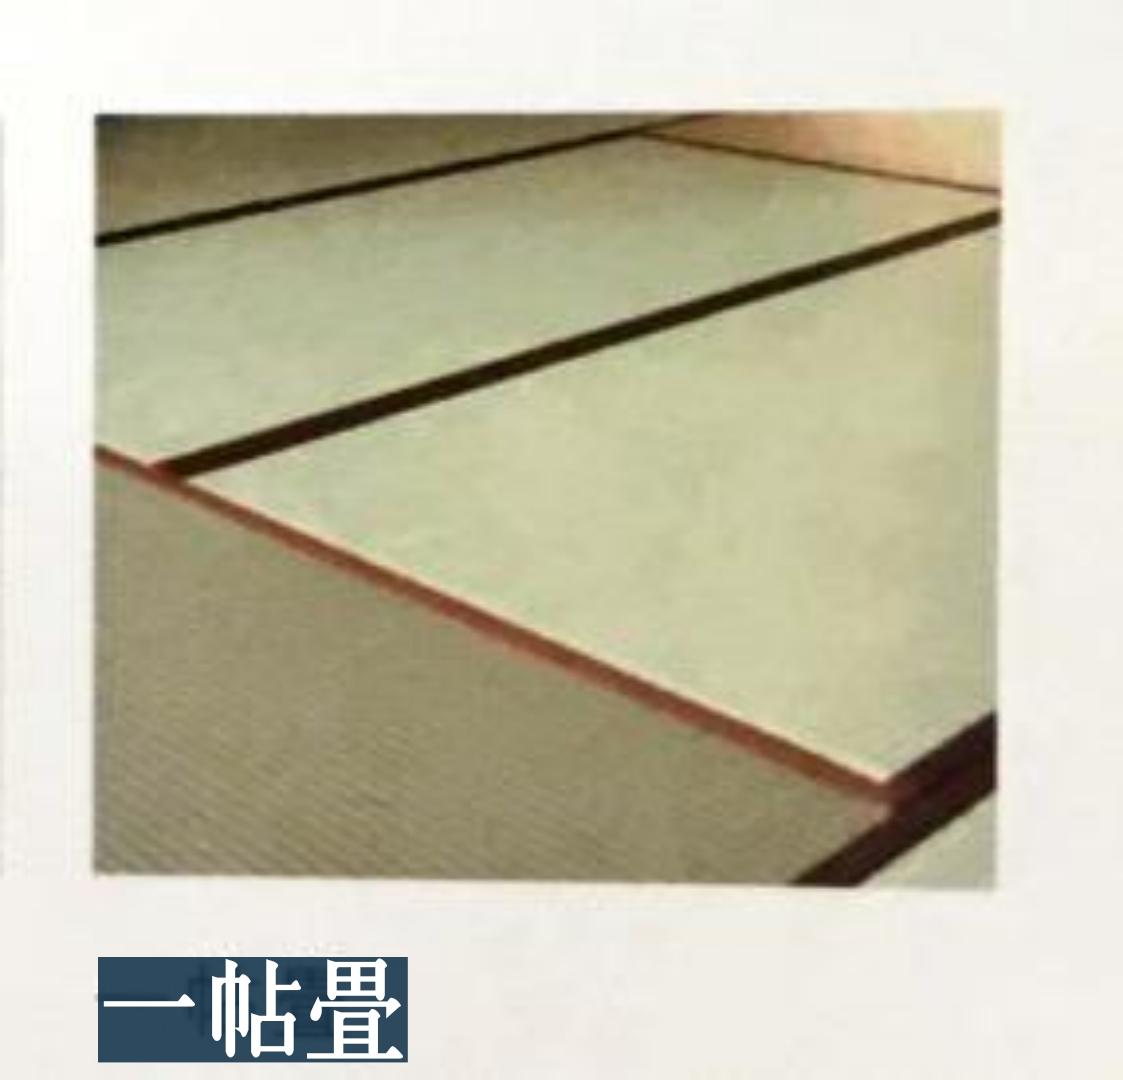 f:id:shioyan1130:20210114235430j:plain